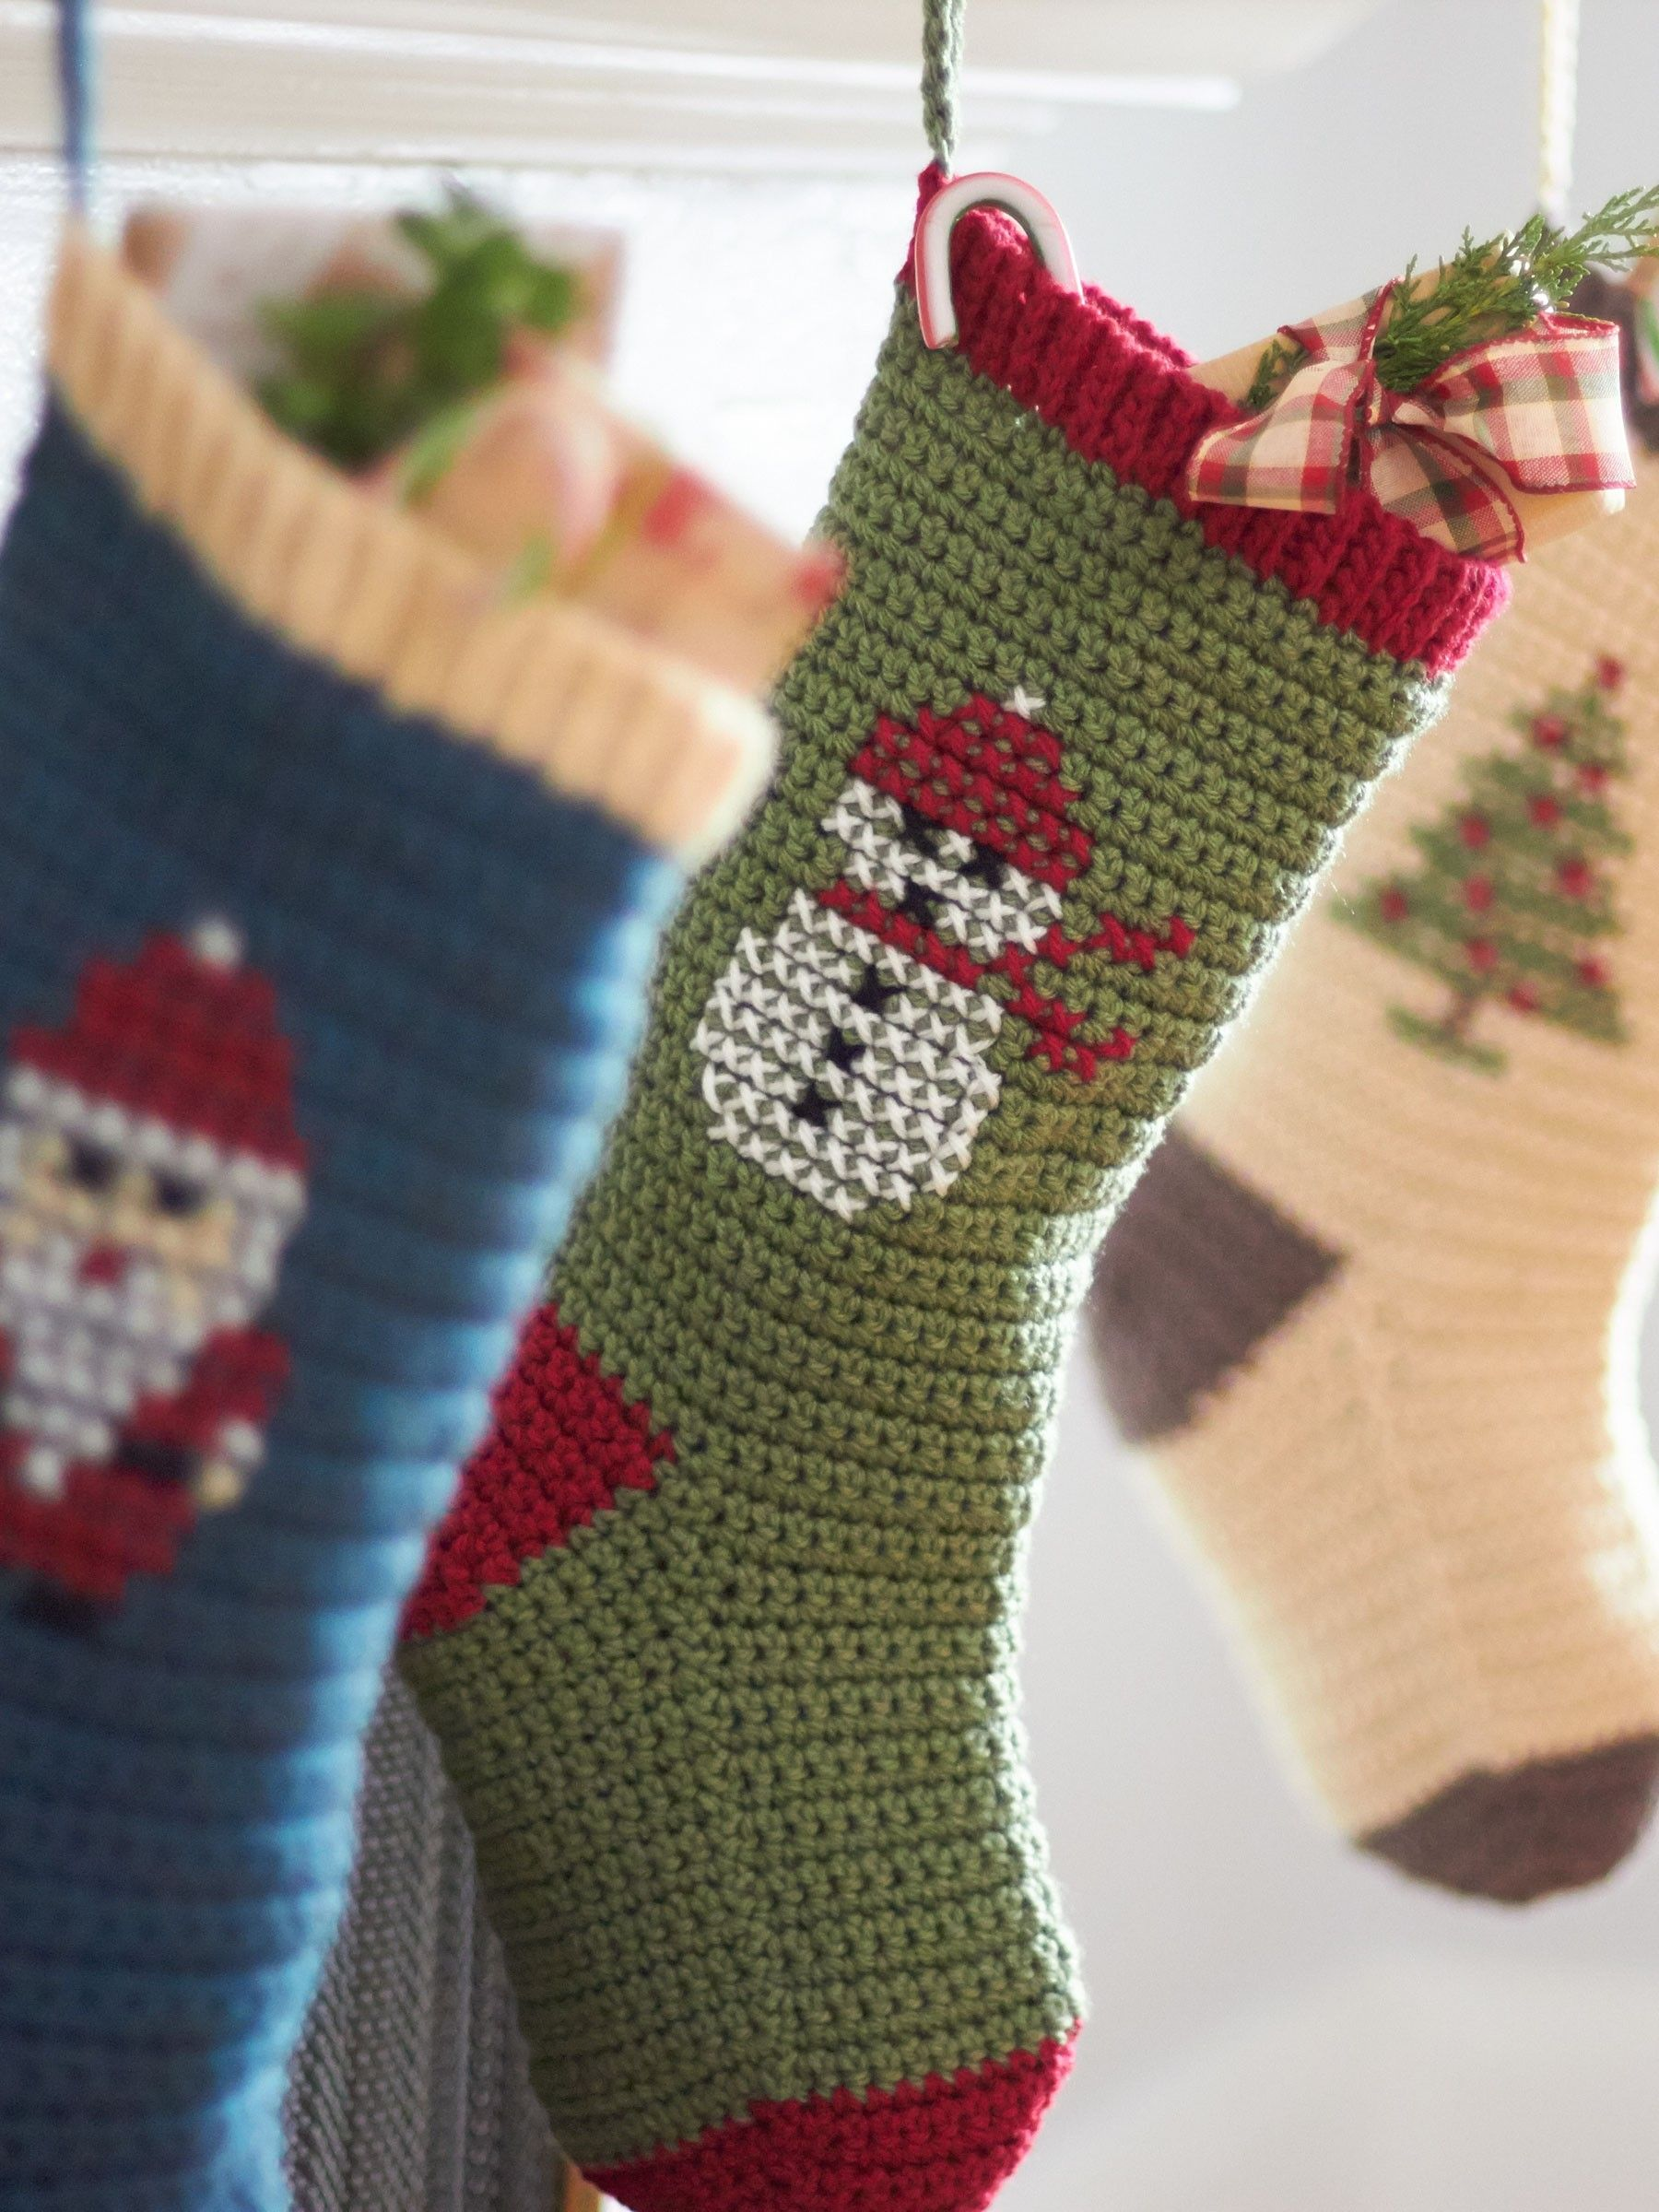 Cross Stitch Christmas Stockings | Hooked On Crochet | Pinterest ...